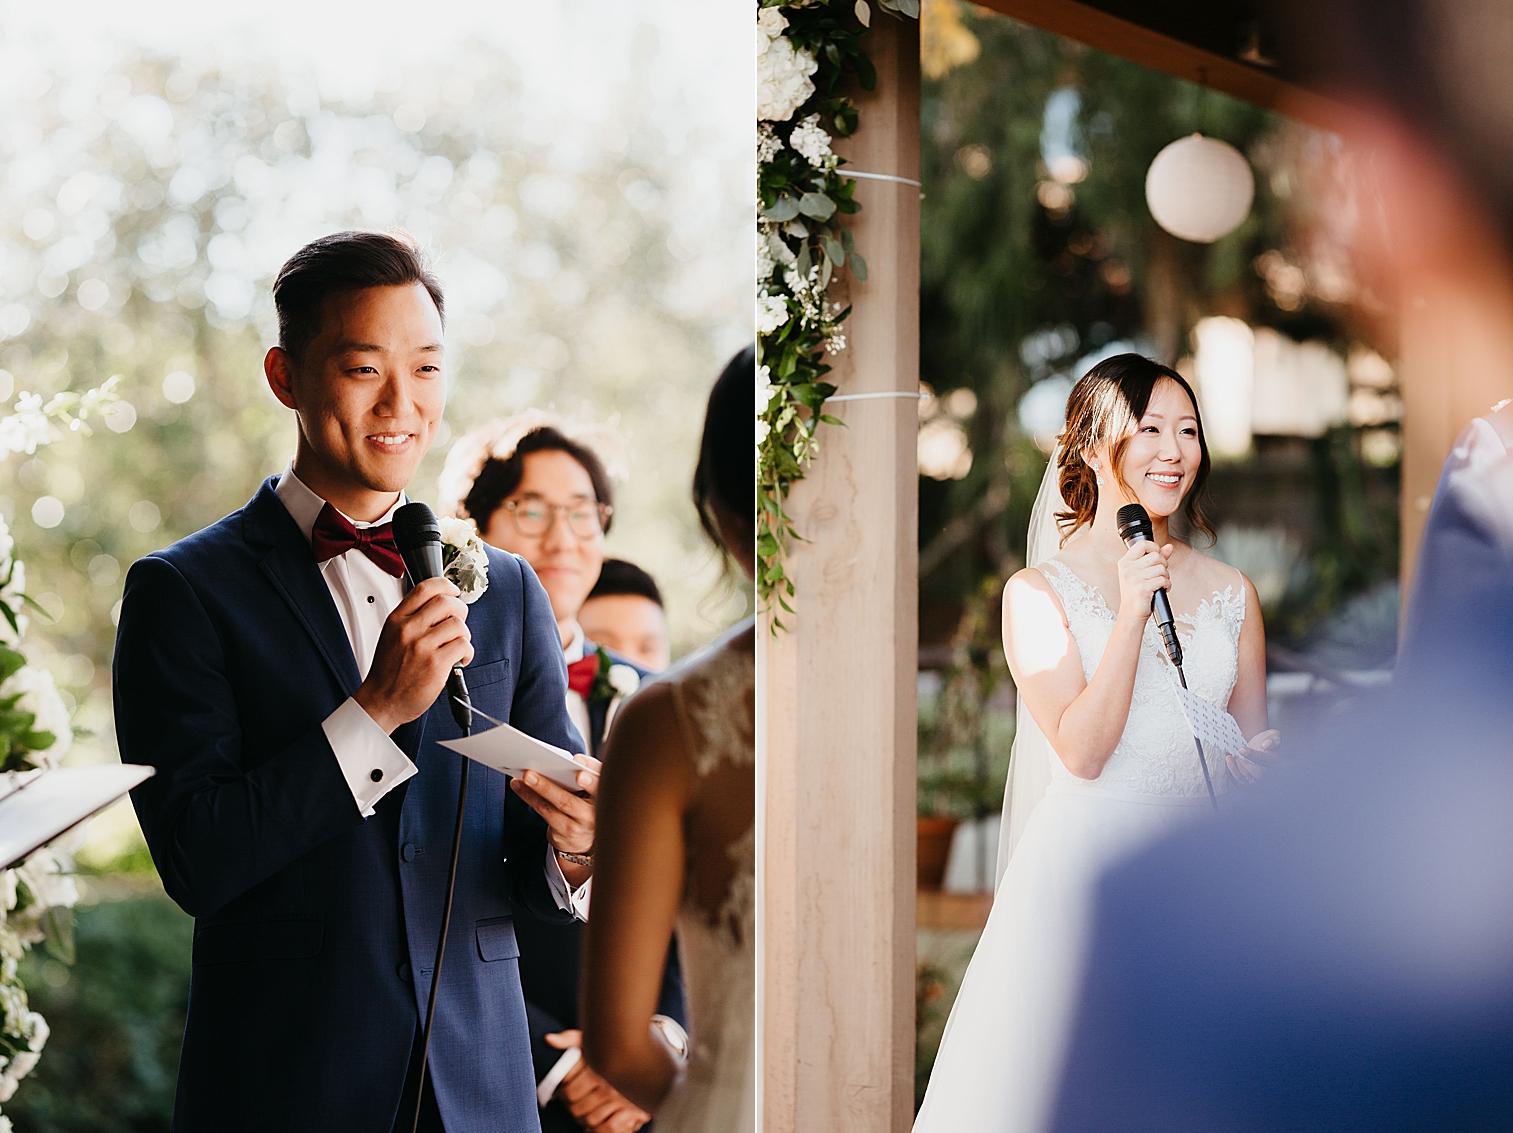 Secret-Garden-Rancho-Santa-Fe-Wedding-68.jpg